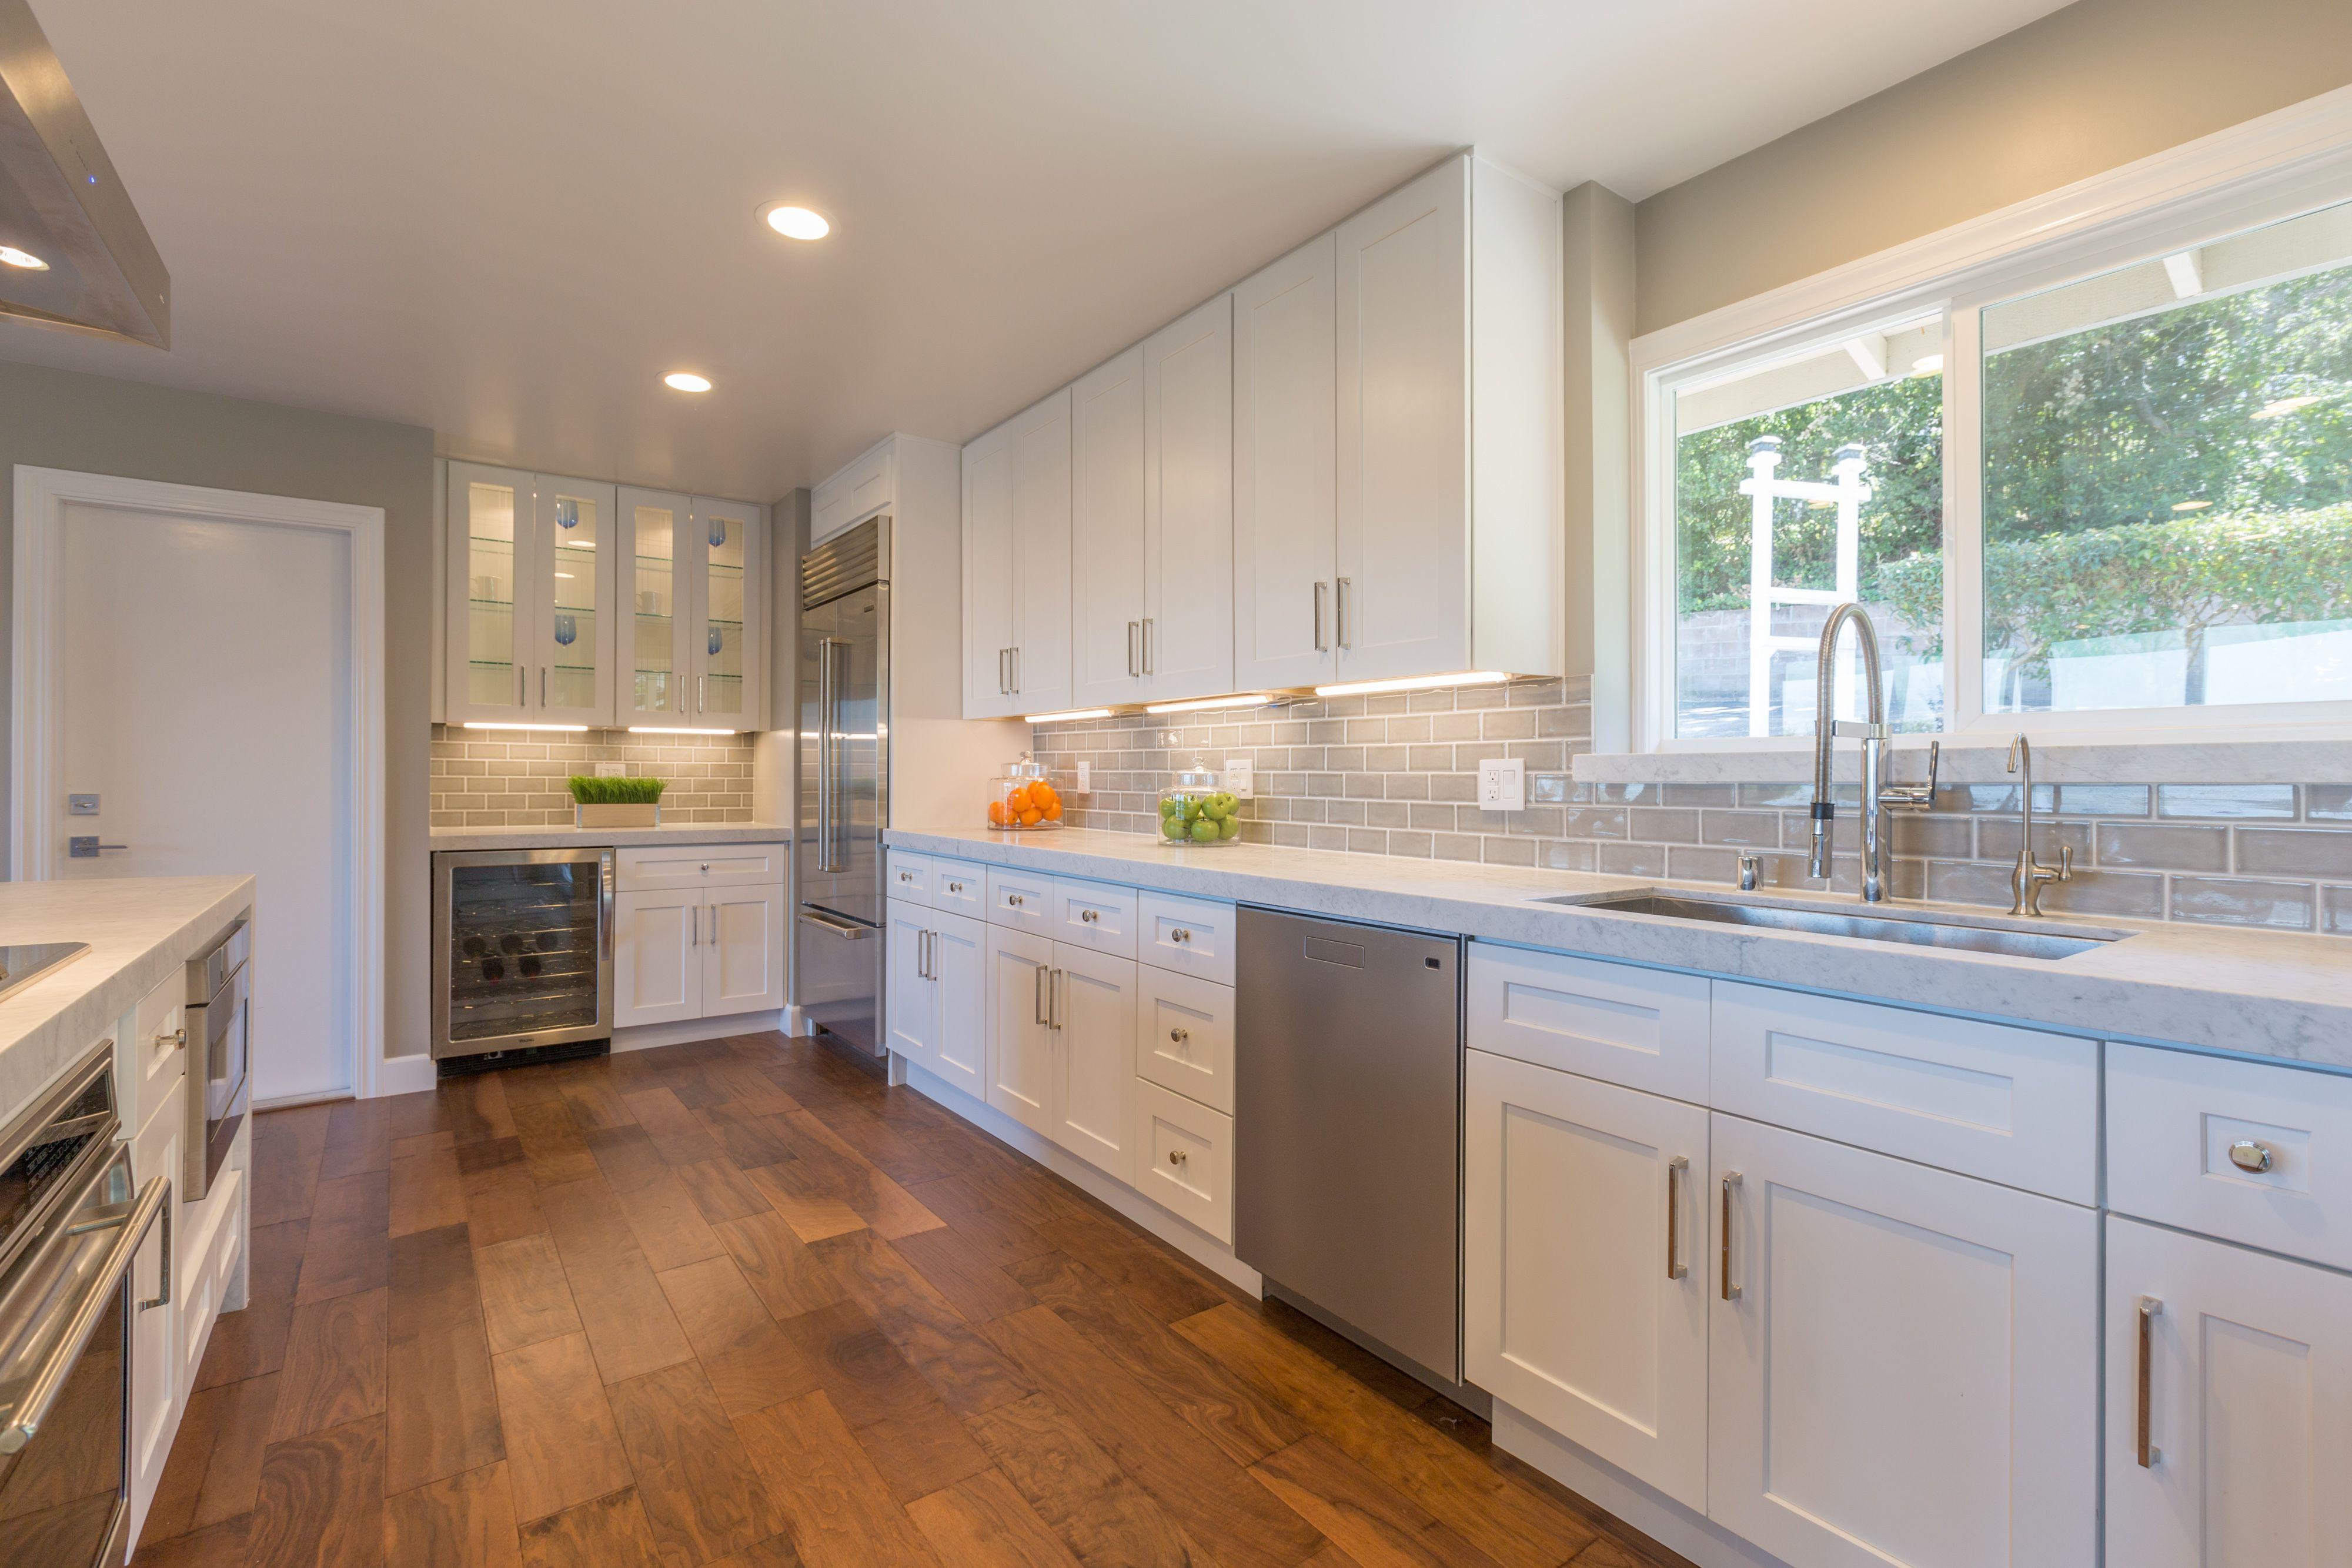 Monica Covington Disen Cai Kitchen Cabinets Design Kitchen